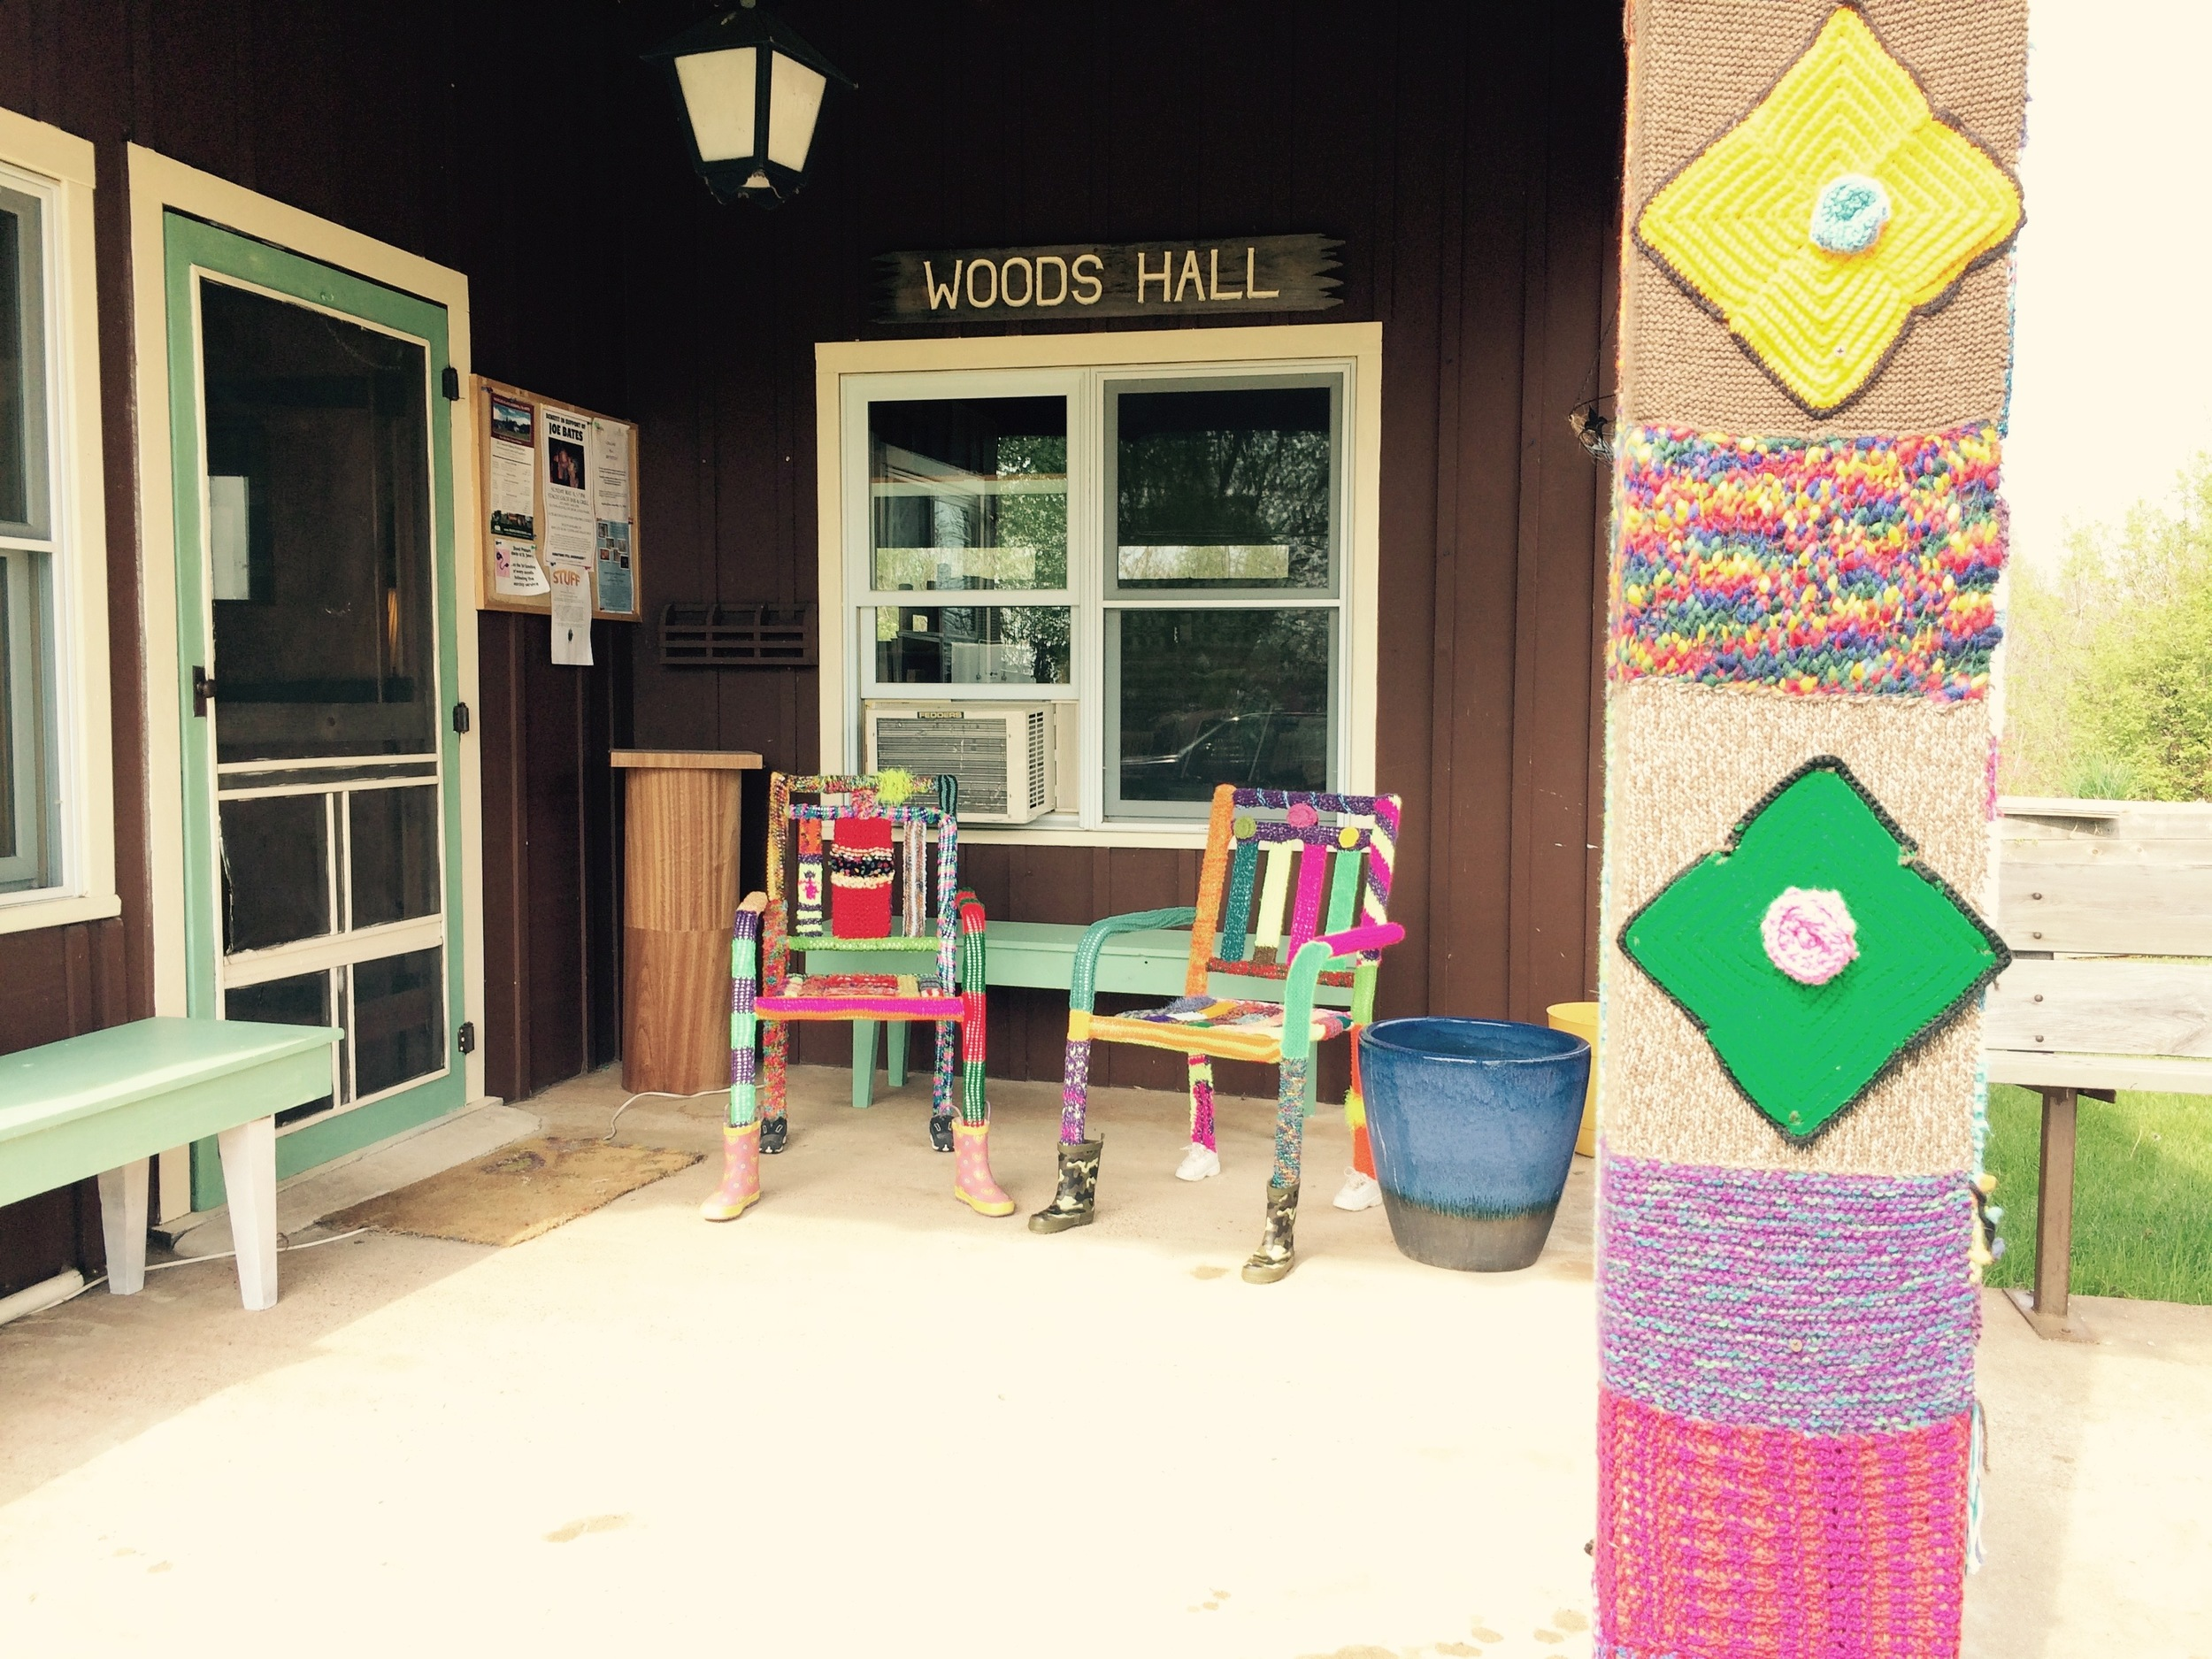 Woods Hall Craft Shop